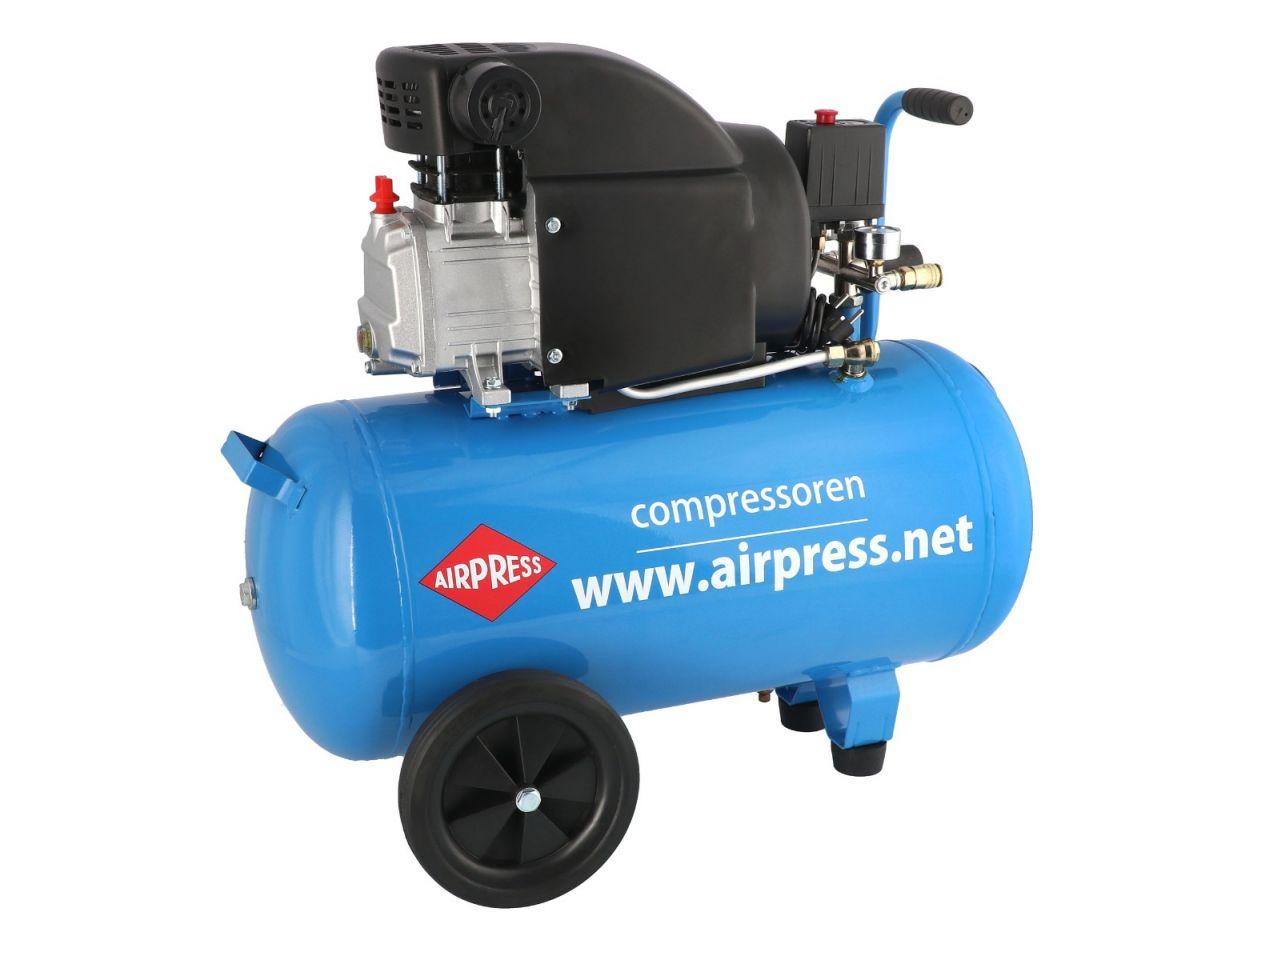 Airpress compressor HL 275/50